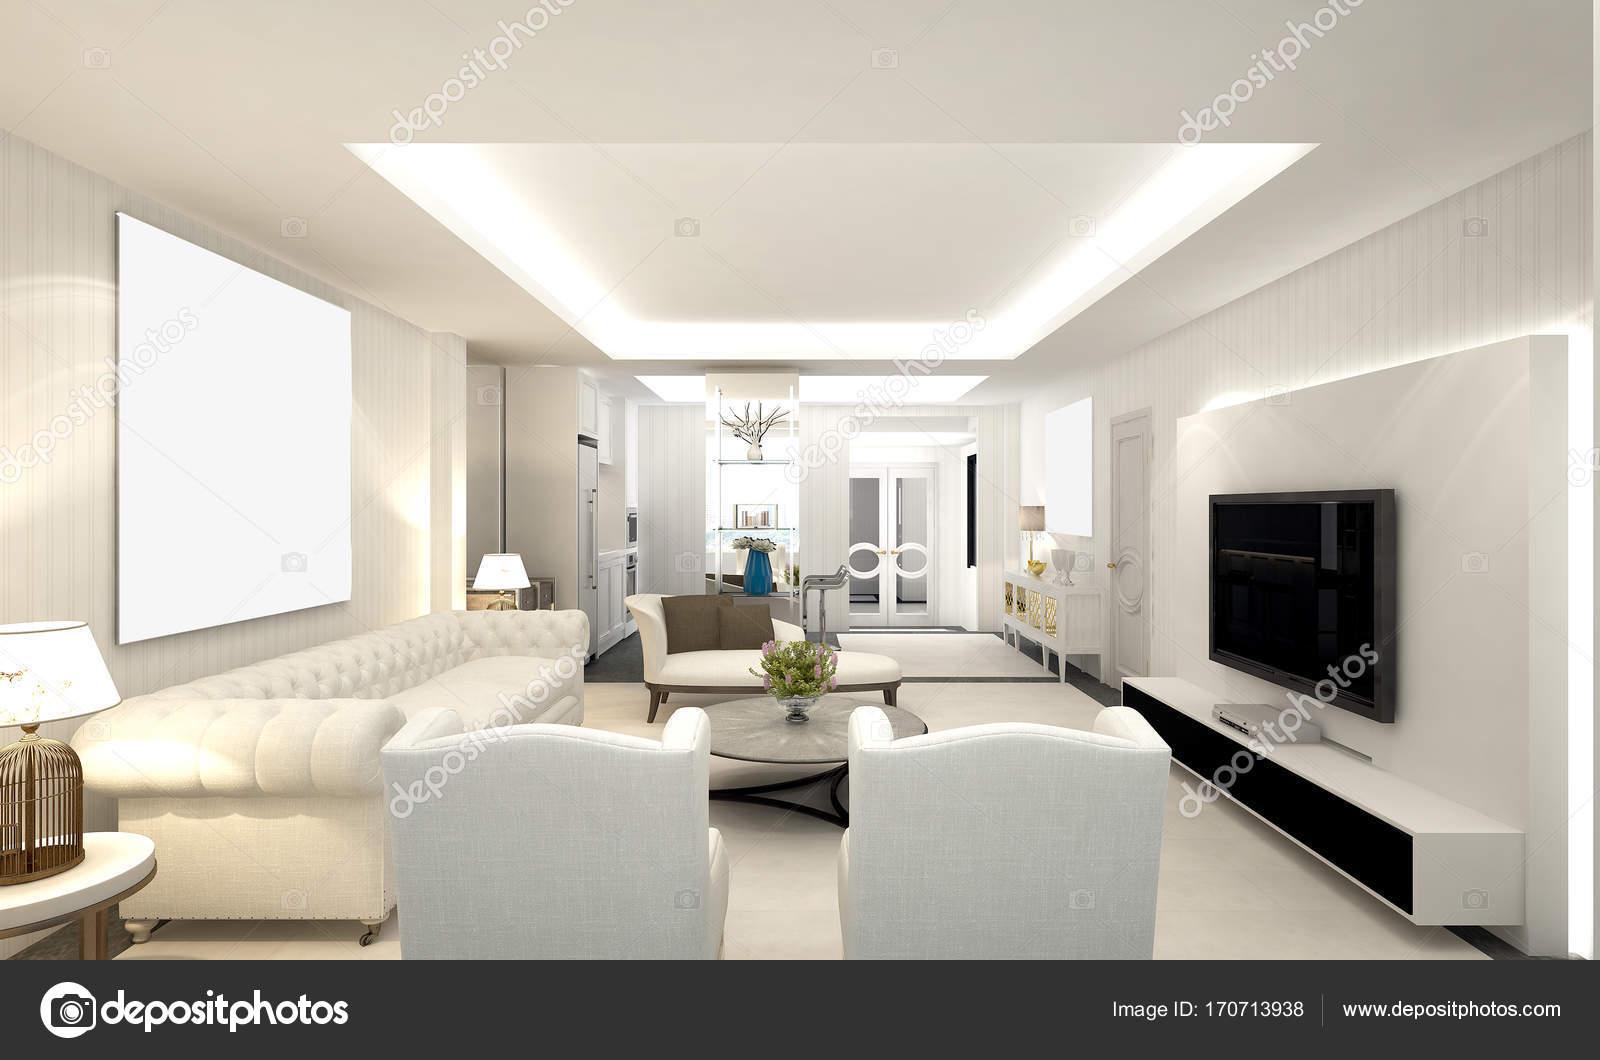 de luxe woonkamer en witte muur patroon design interieur stockfoto teeraphan 170713938. Black Bedroom Furniture Sets. Home Design Ideas